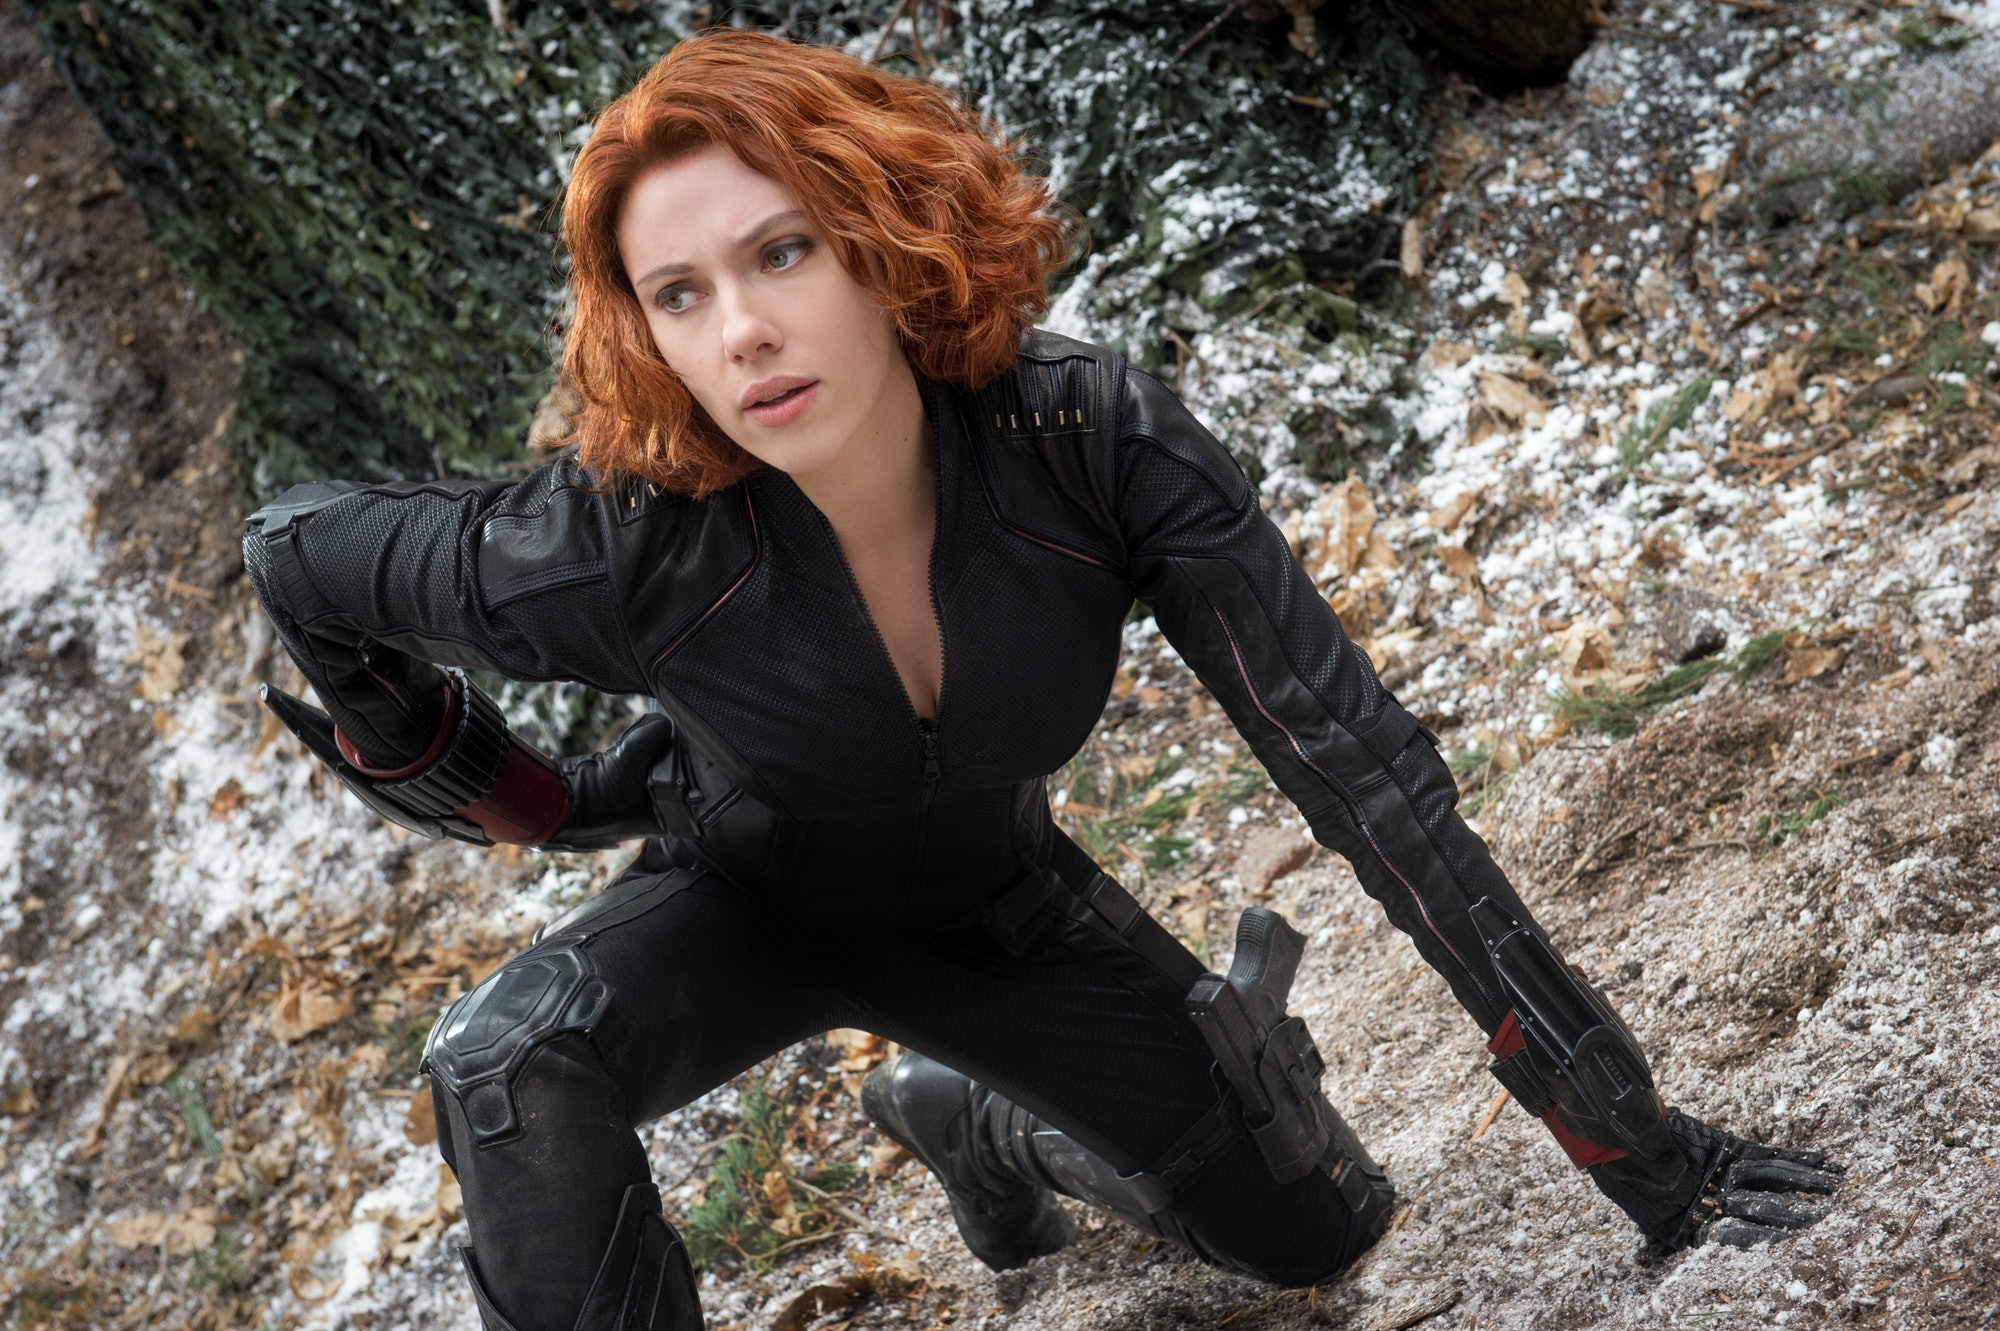 Marvel Black Widow Avengers Age of Ultron